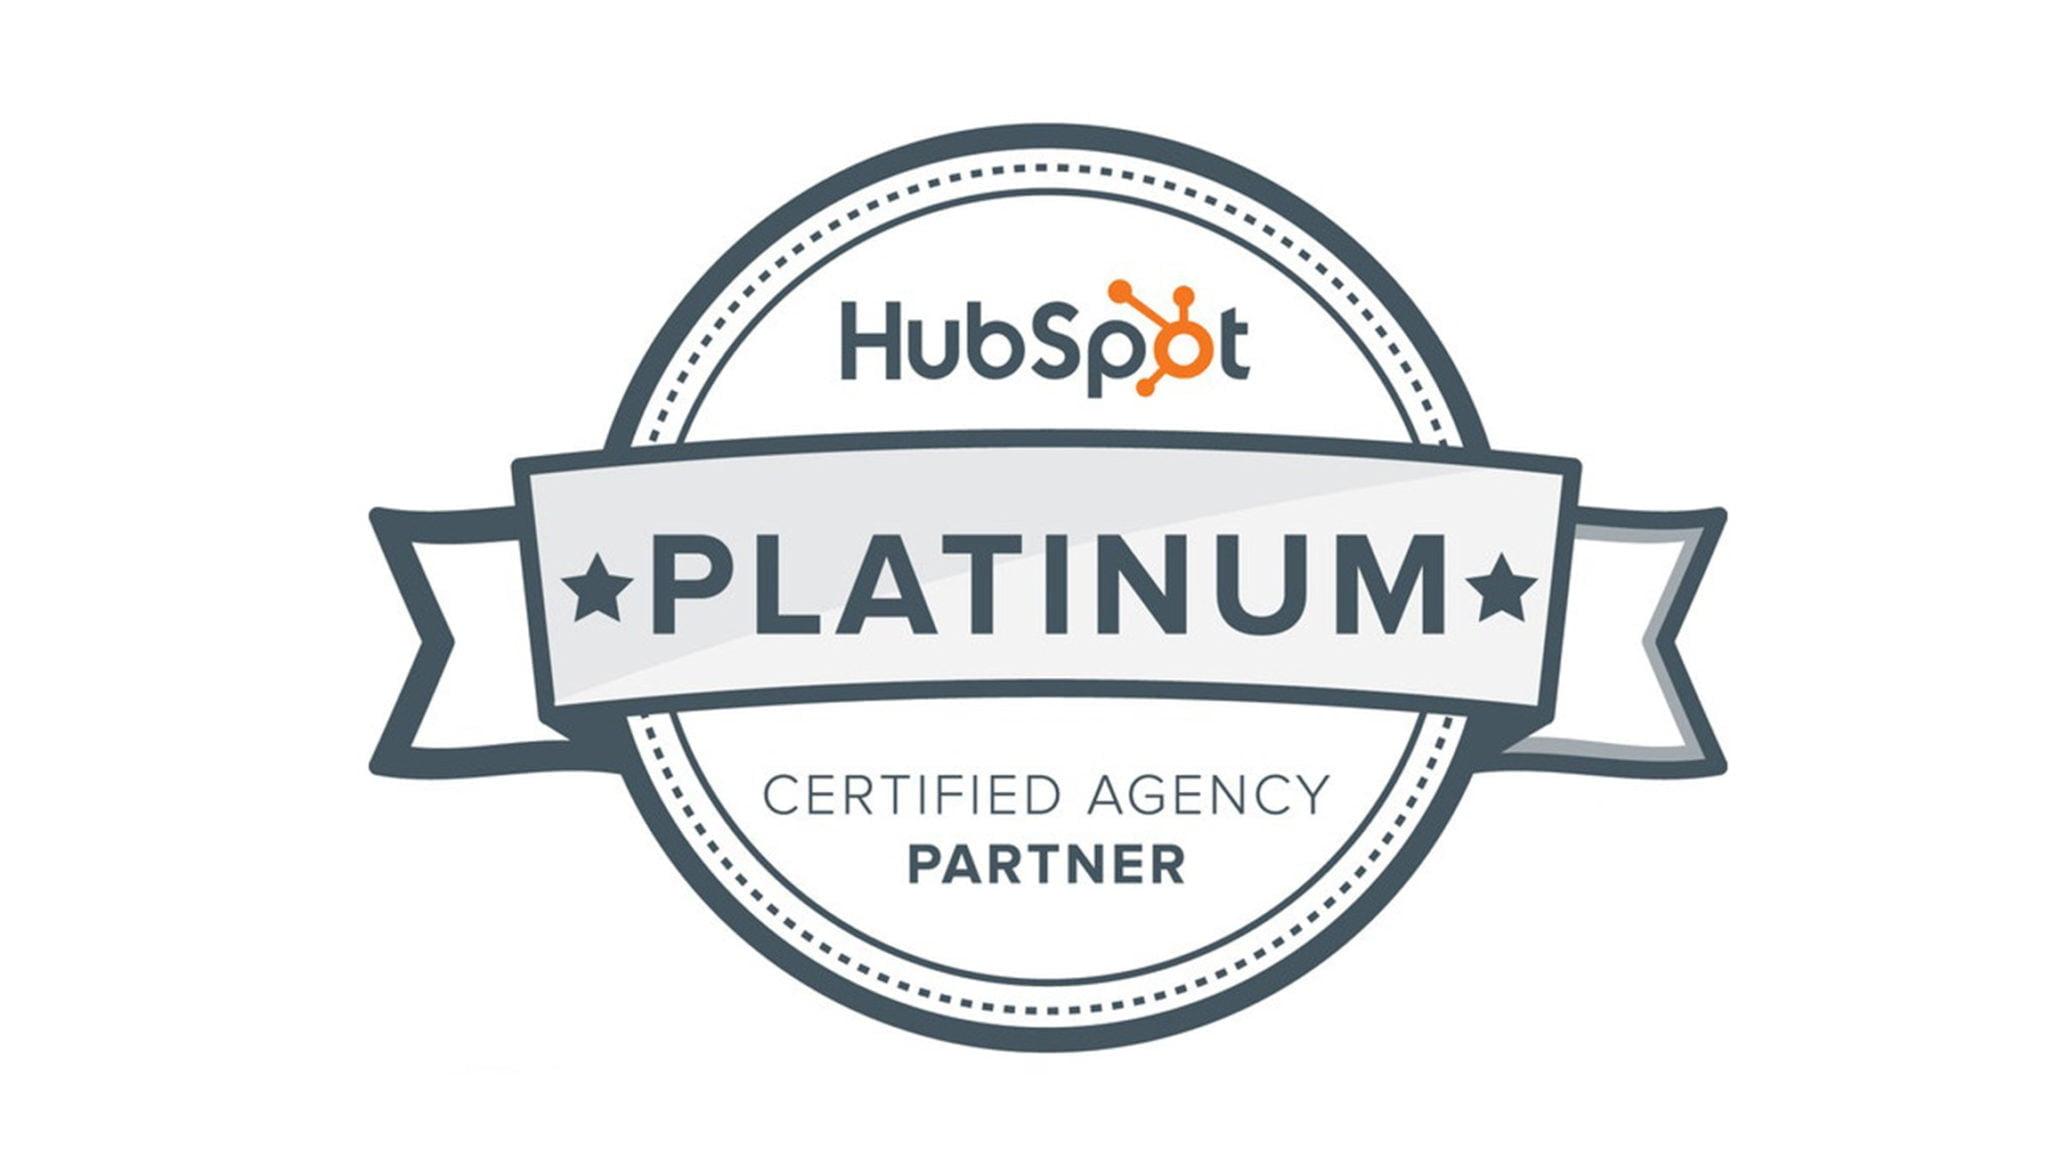 Nexa Achieve HubSpot Platinum Partner Tier Status – MarTech Series